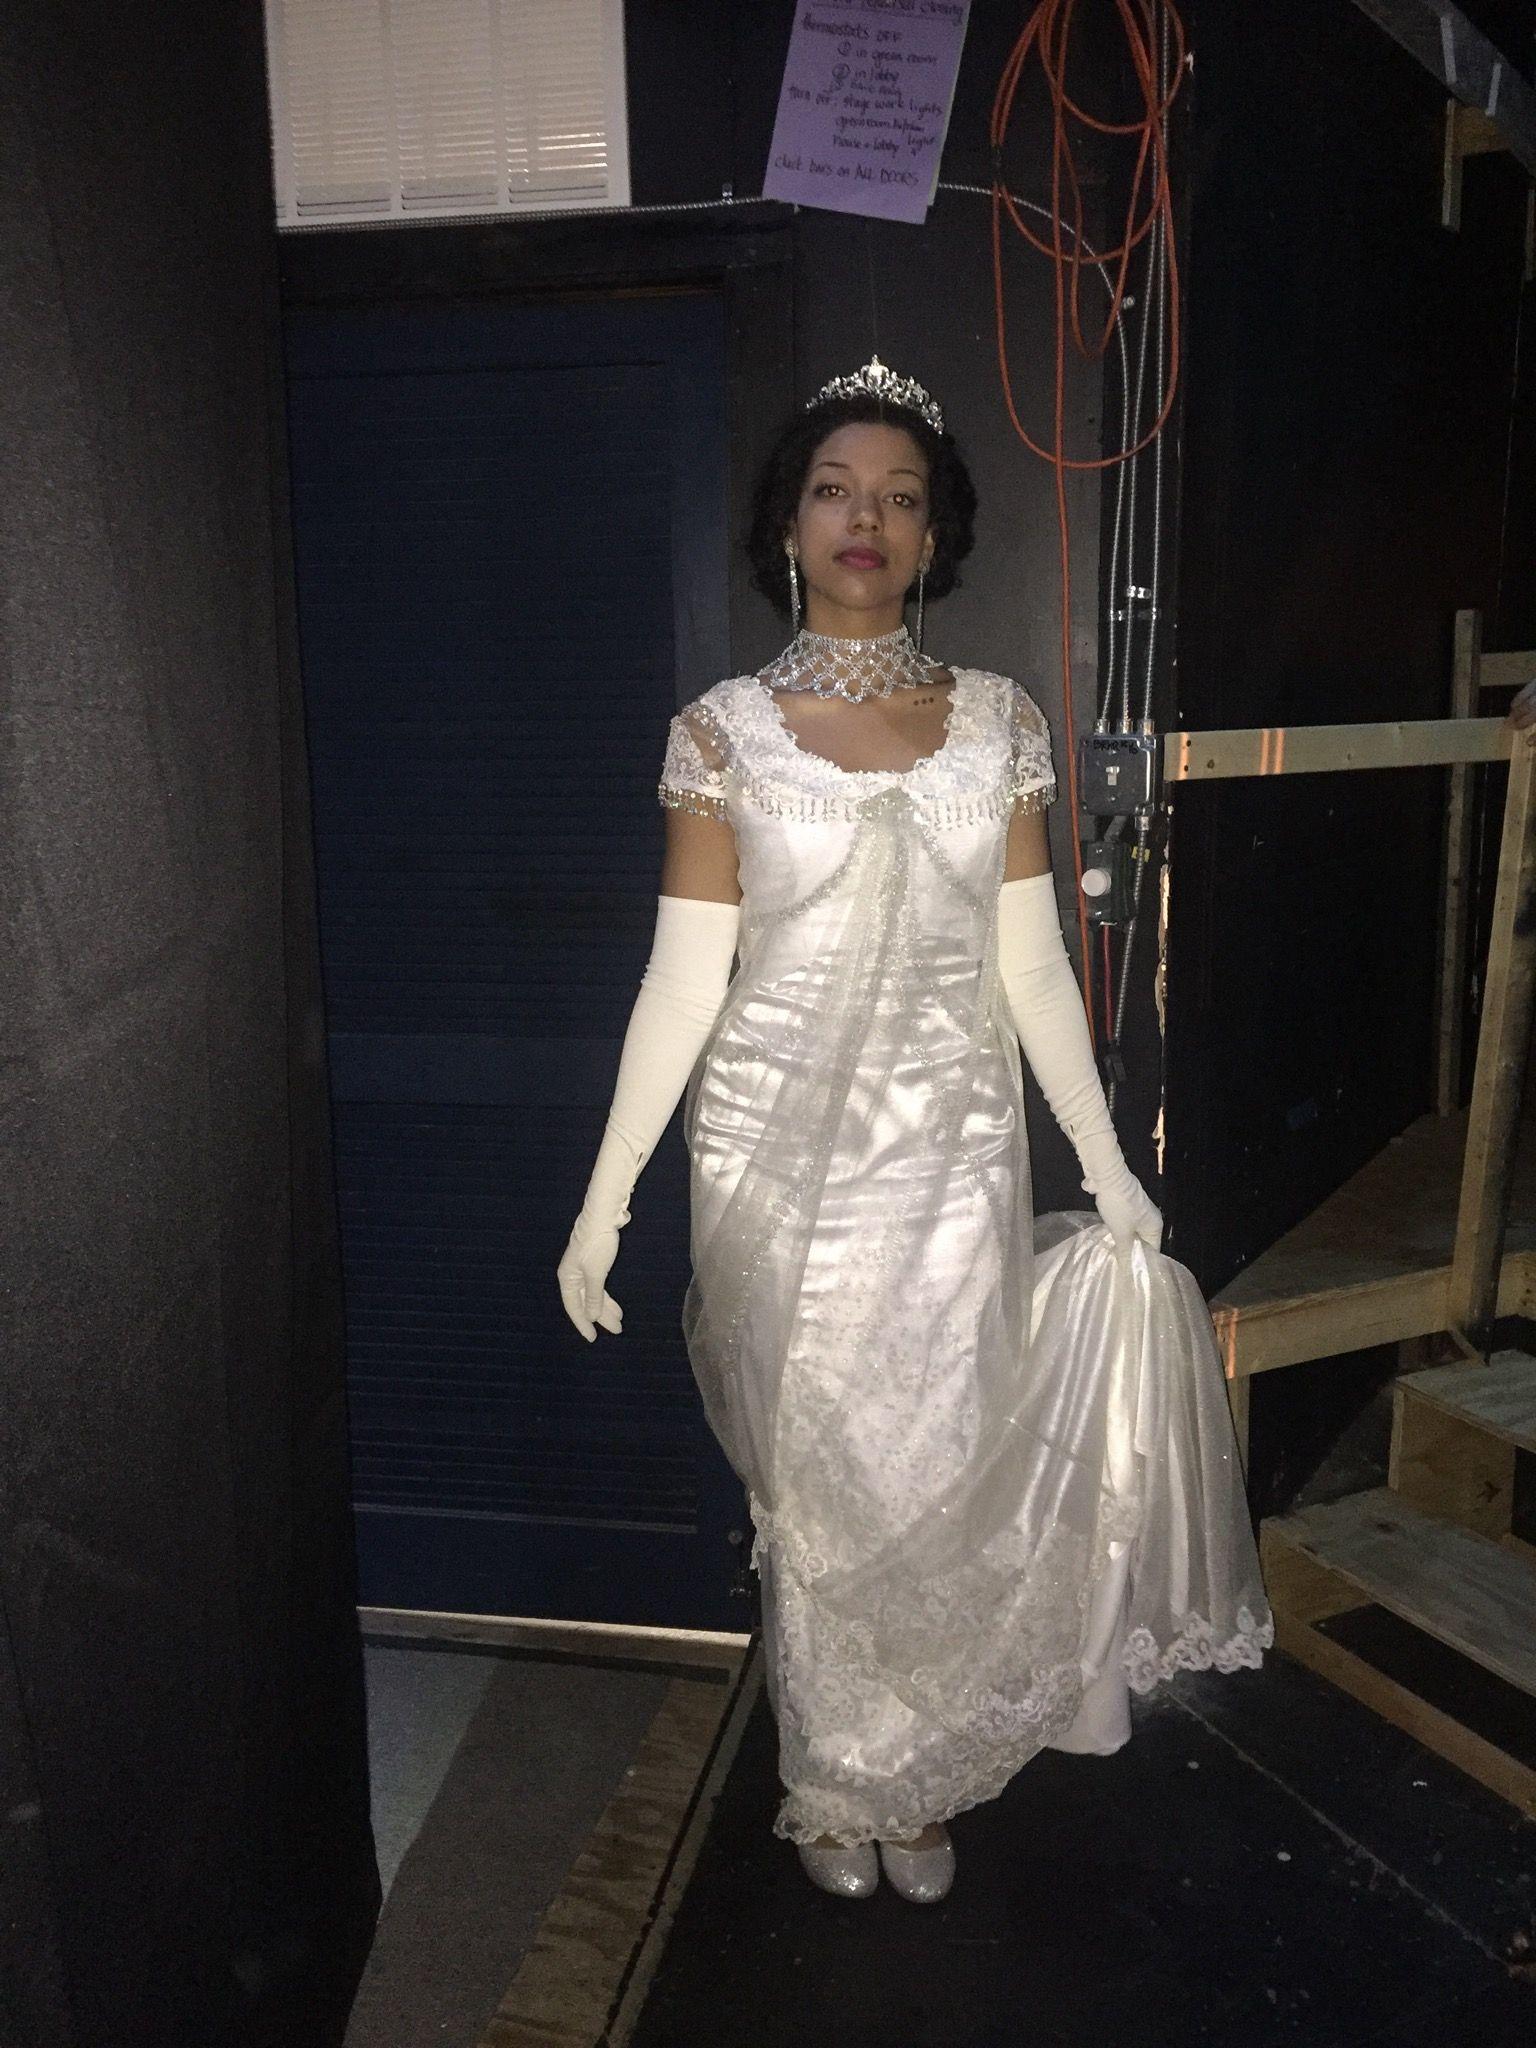 My Fair Lady, June 2016. Jessica Mainor as Eliza Doolittle Ballroom ...